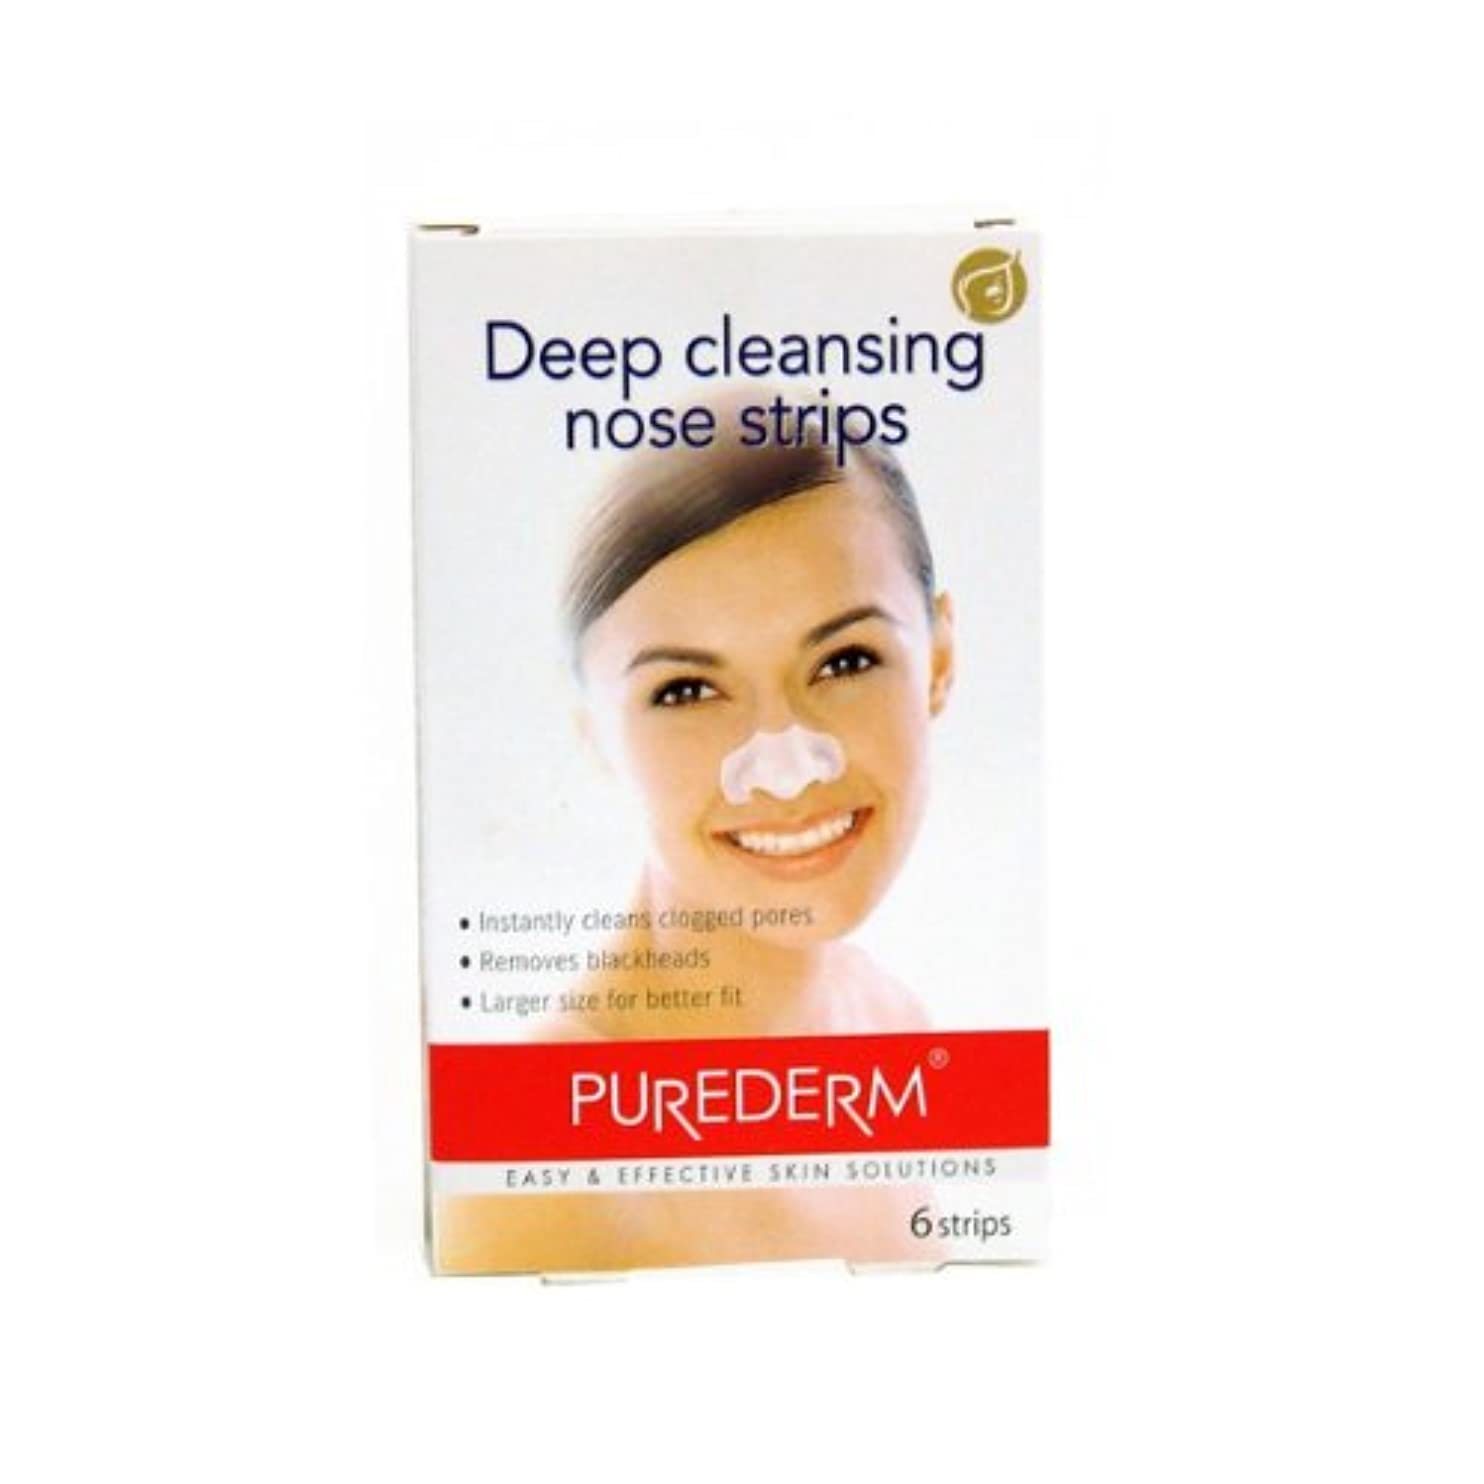 Purederm Deep Cleansing Nose Strips X 6 [並行輸入品]